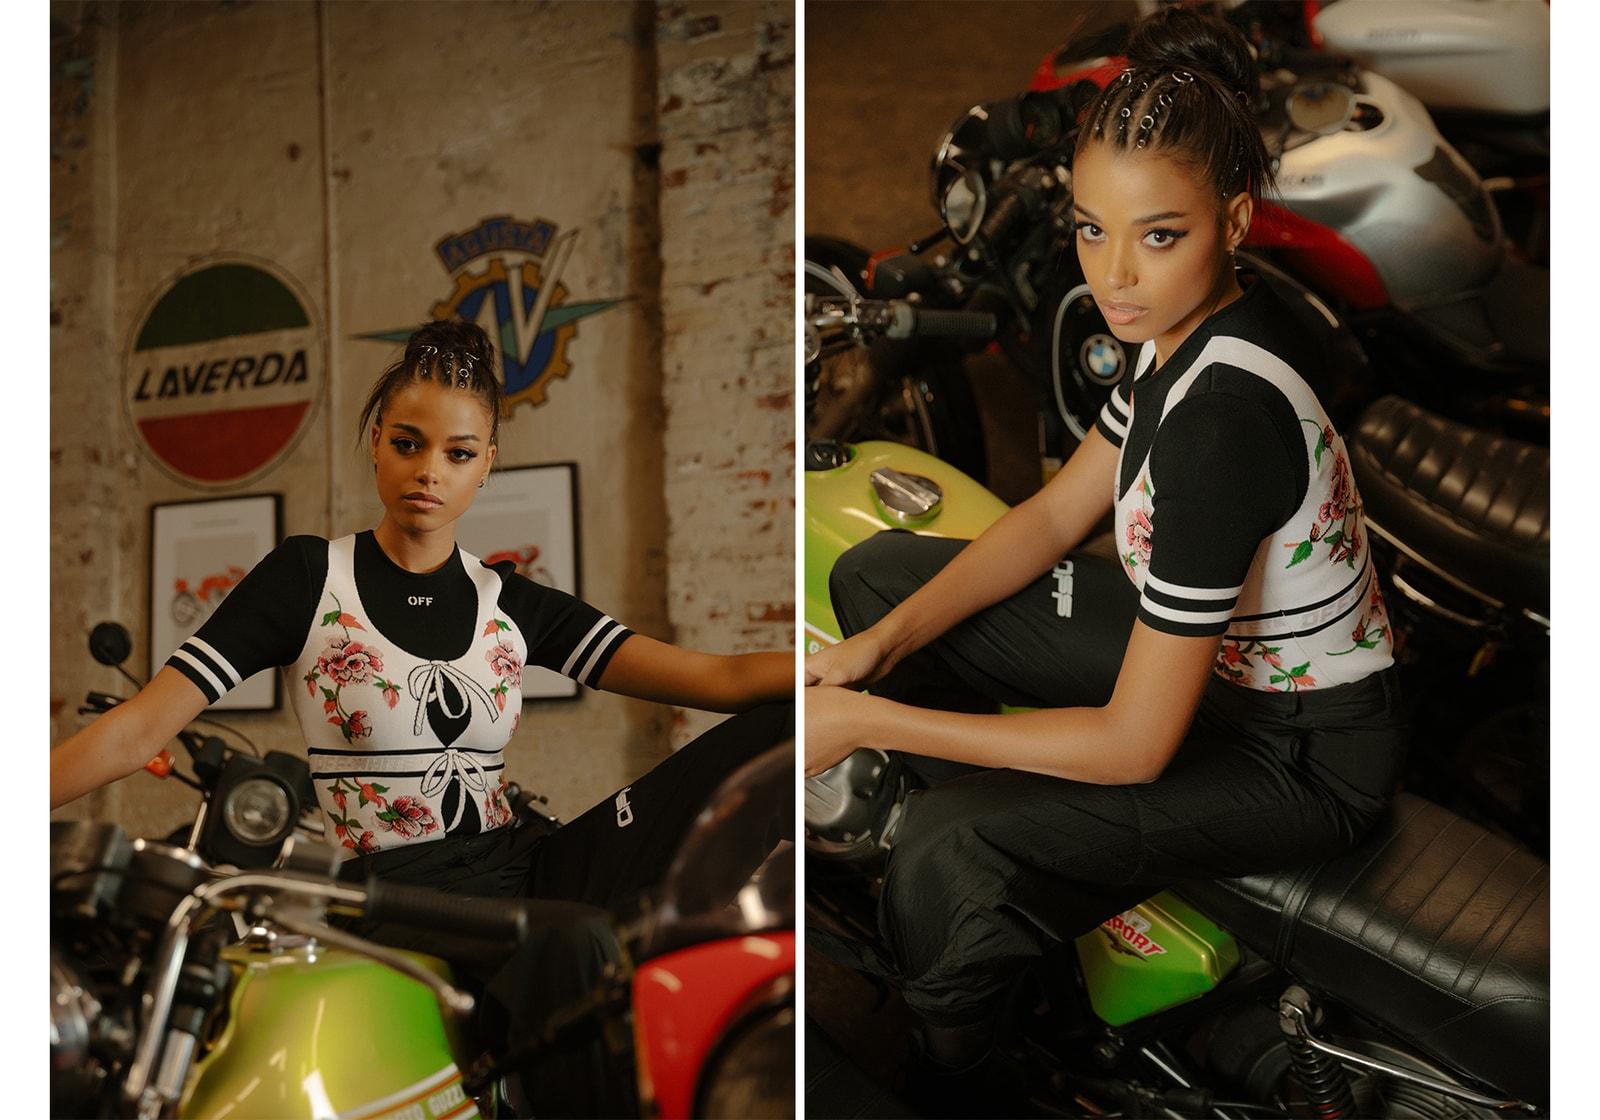 Ella Balinska Charlie's Angels Actor Actress Jane Kano Fashion Editorial Motorcycle Bike Helmet Off-White Virgil Abloh Top Black Floral Vest